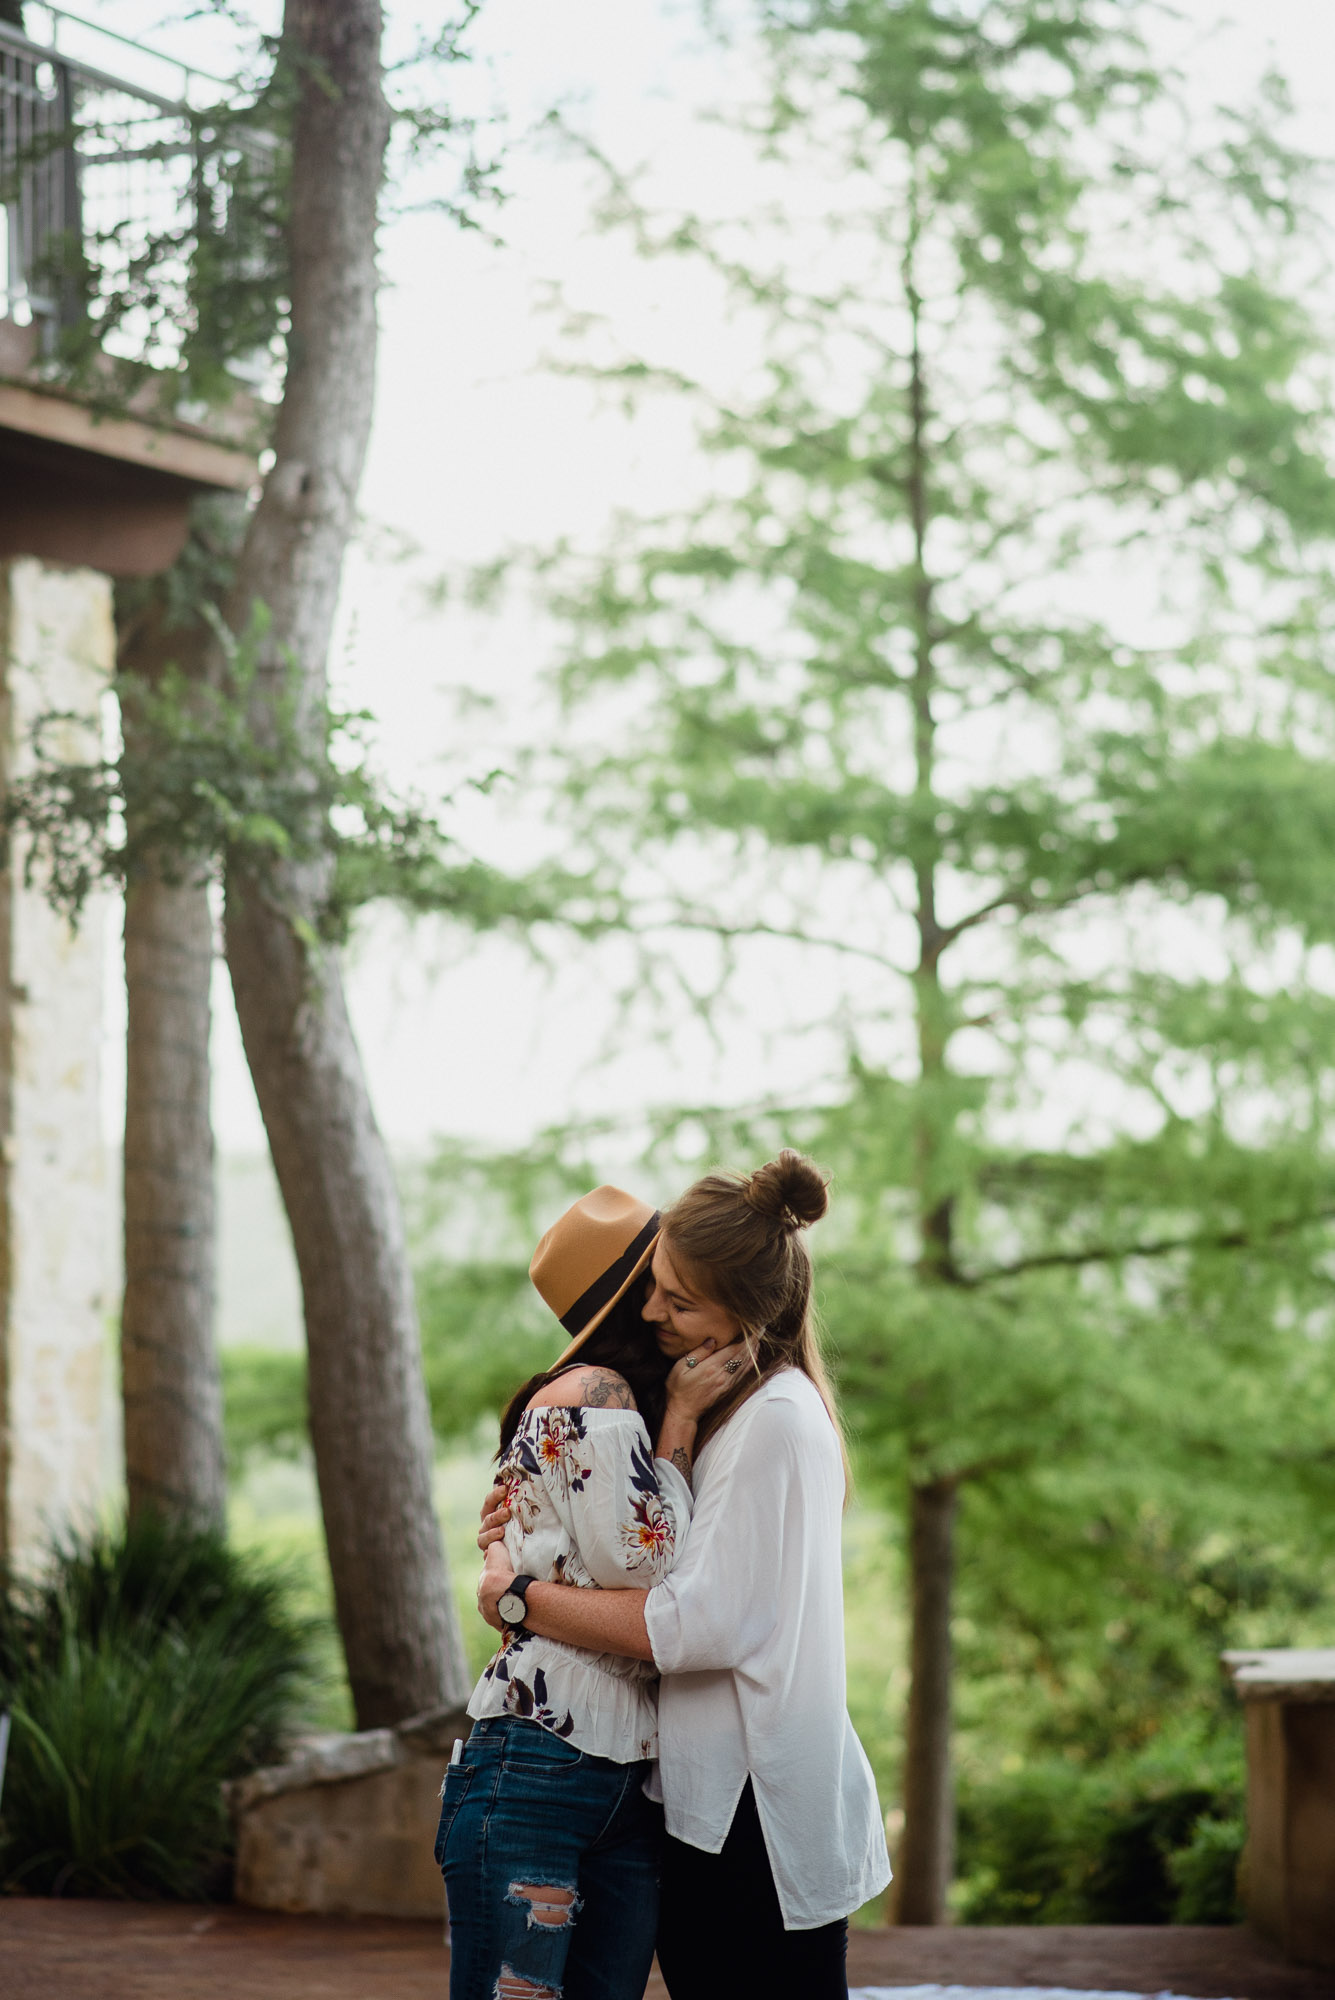 Austin lgbtq wedding and portrait photographer, same sex engagement session, Austin same sex proposal